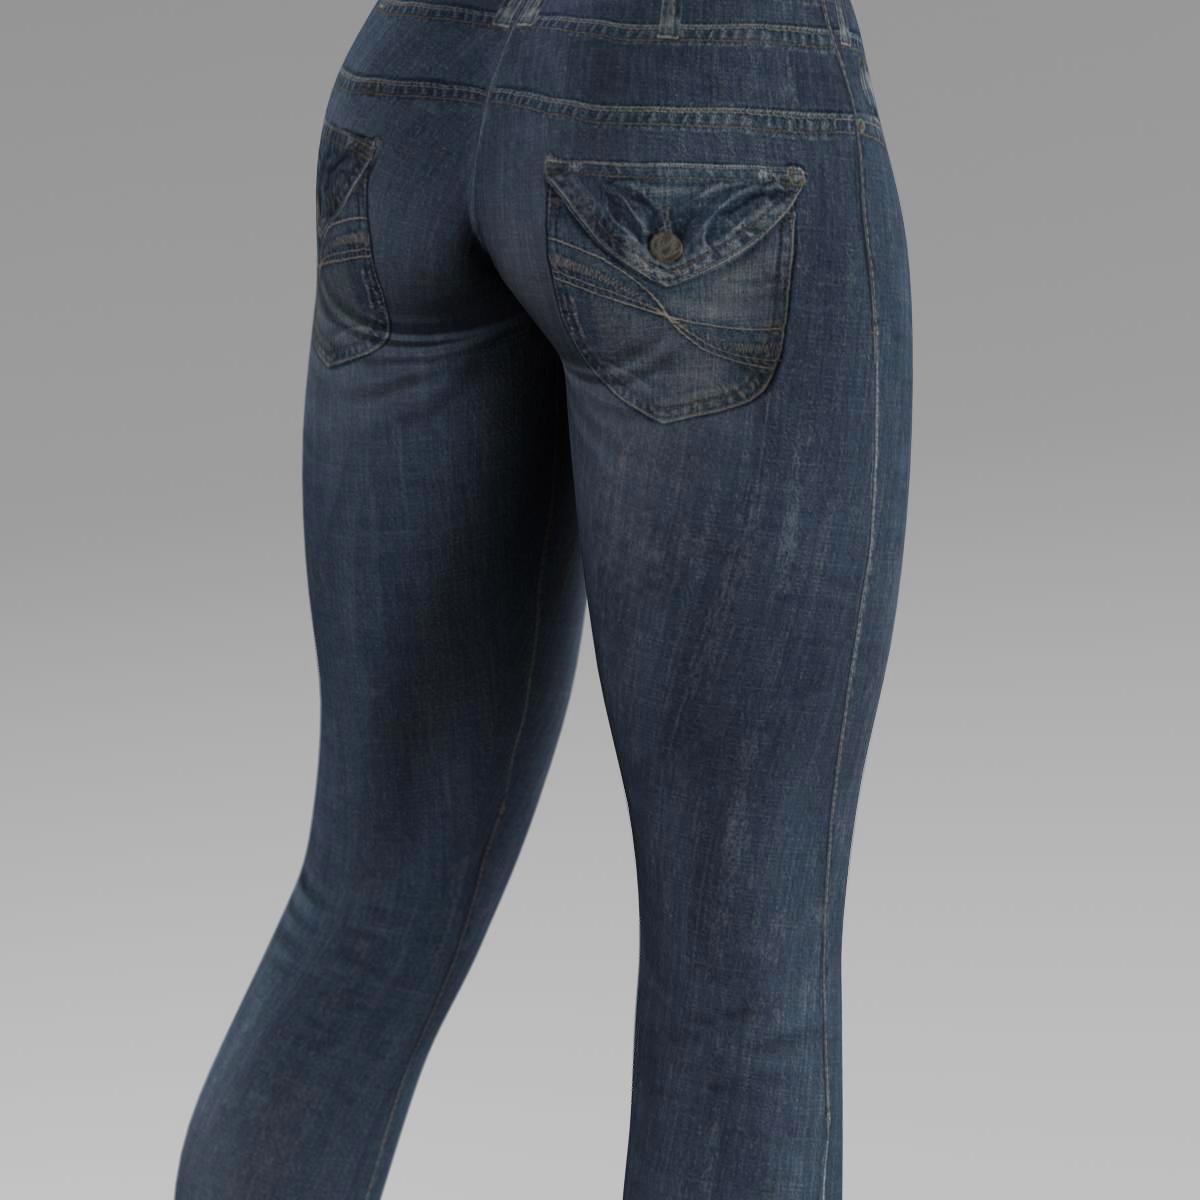 female jeans 3d model 3ds max fbx c4d ma mb obj 160406